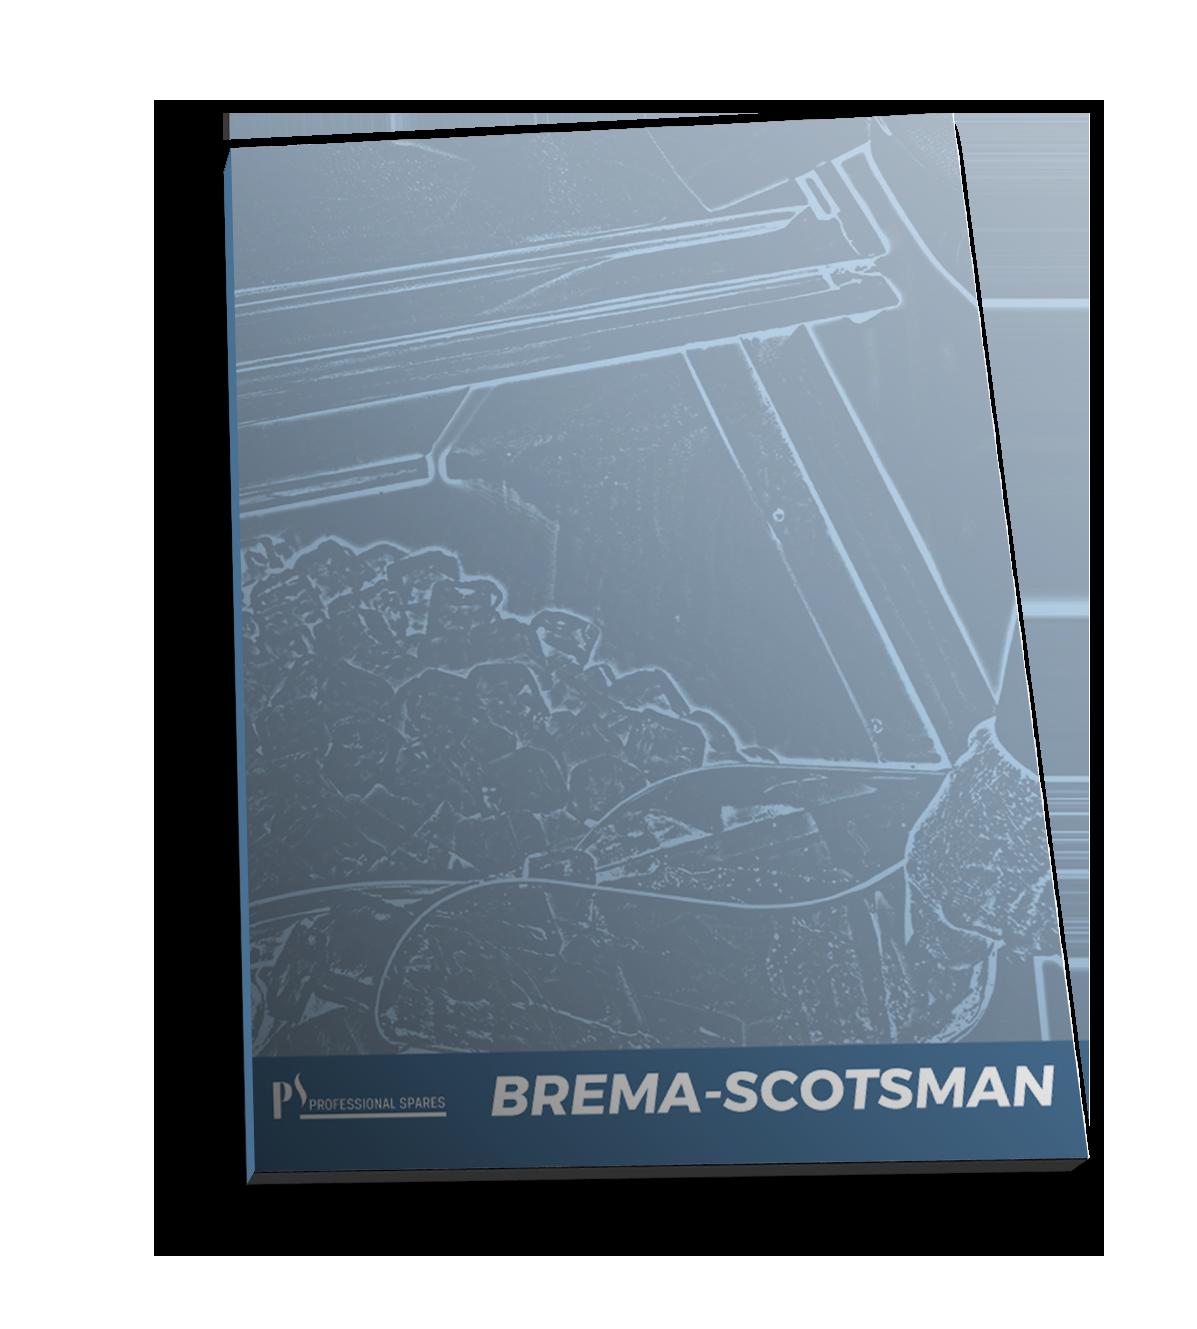 BREMA-SCOTSMAN